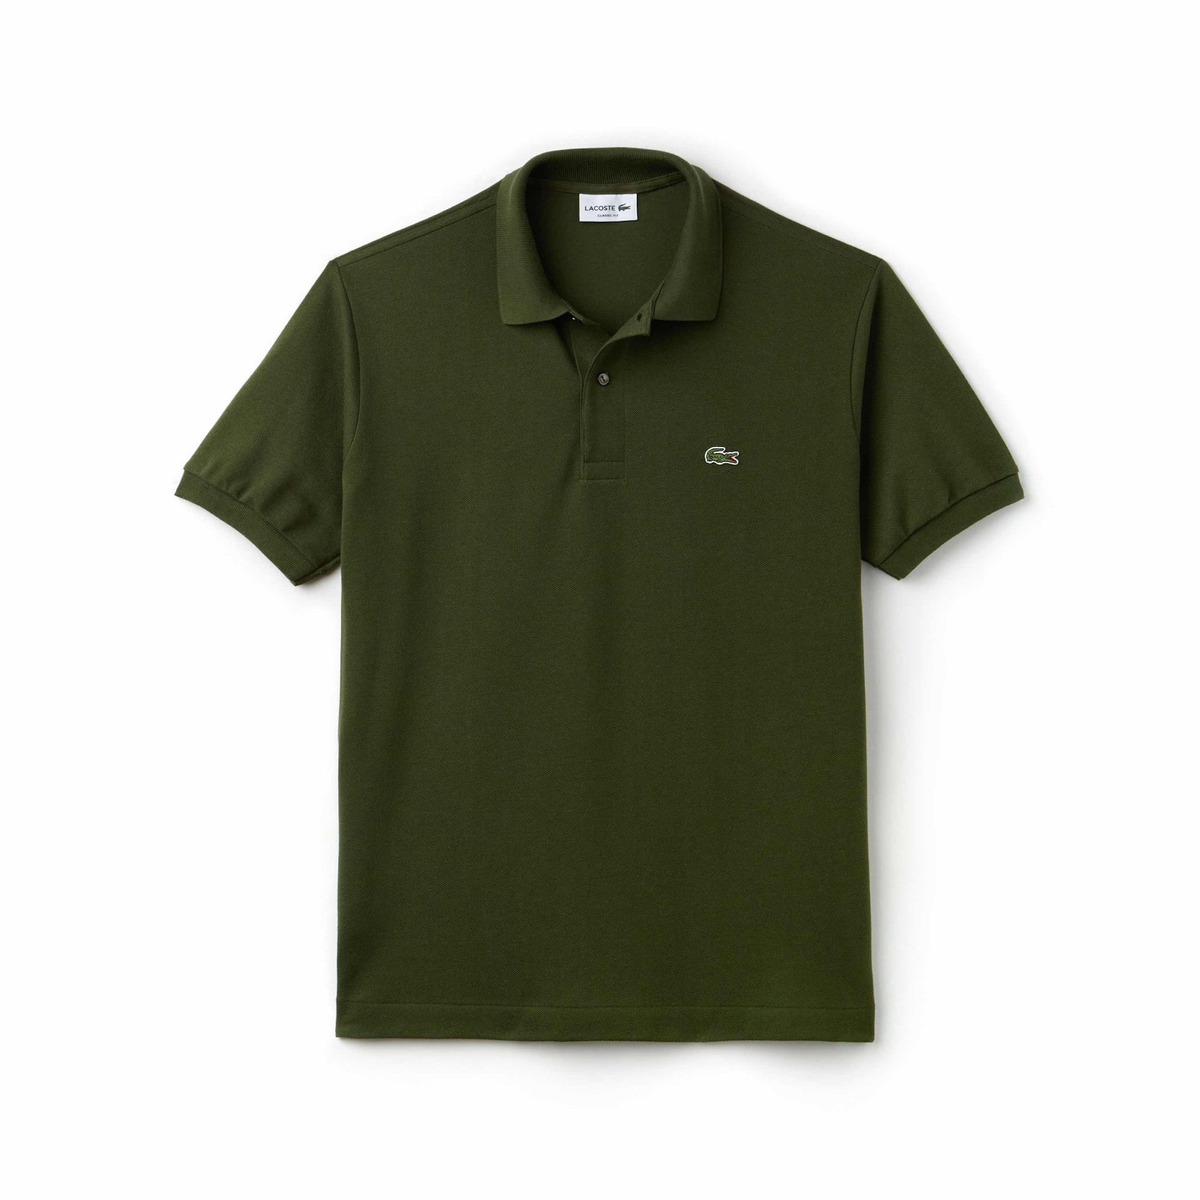 Original L 12 Fit Verde Kaki Classic Polo Lacoste 12 knwO0P